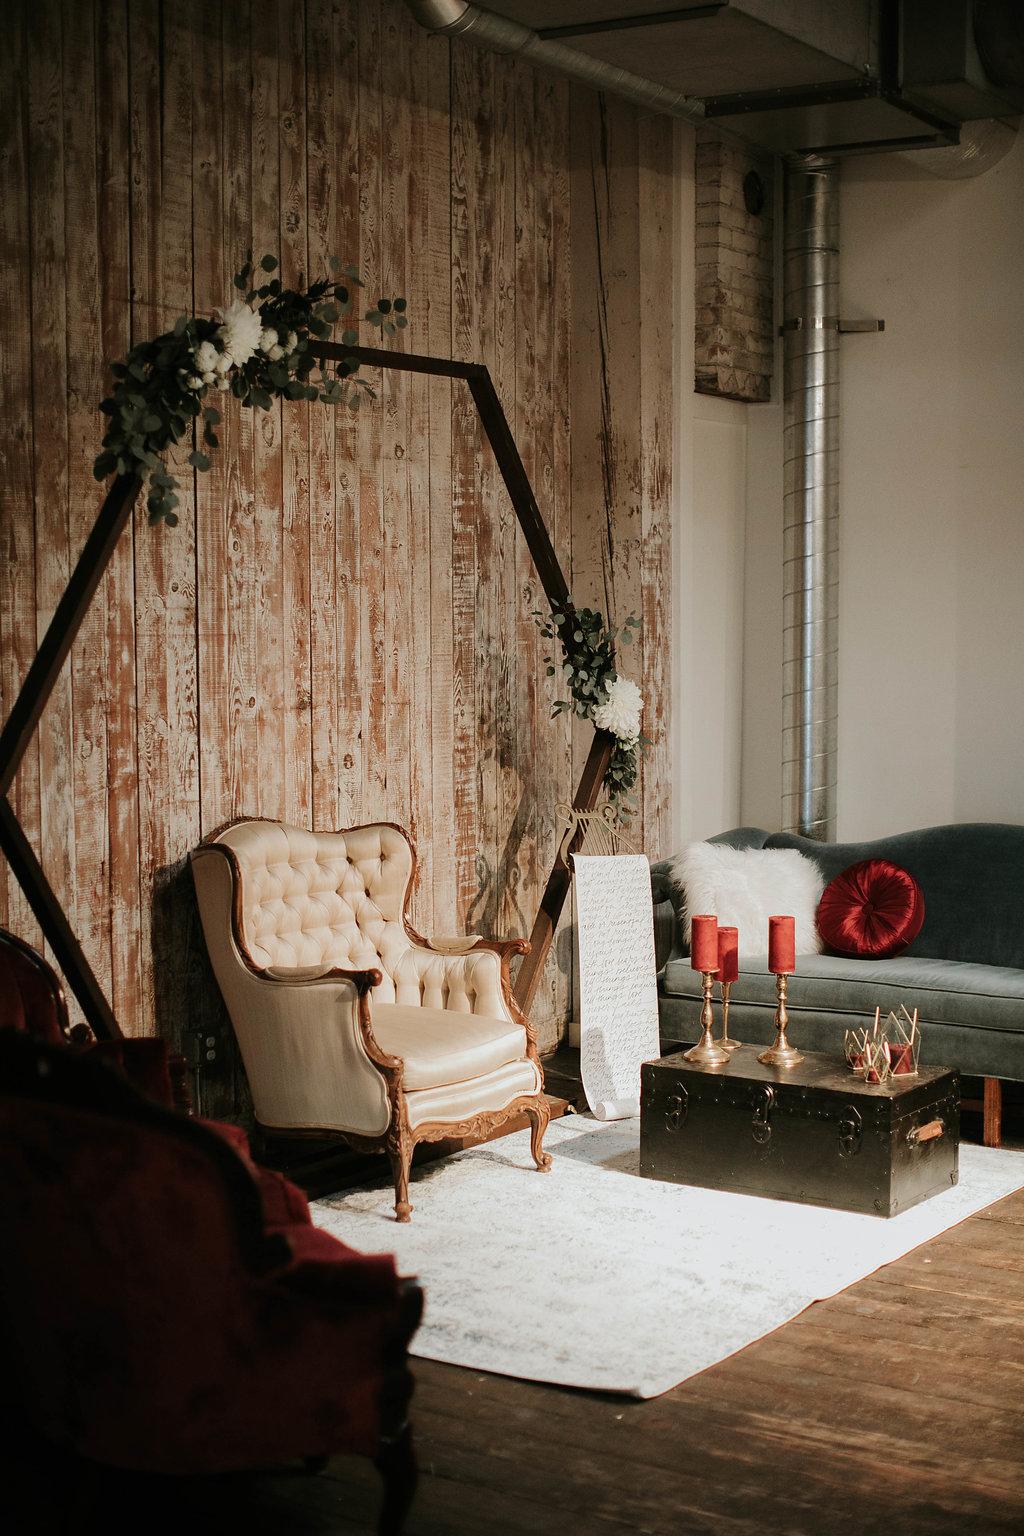 The_Big_Fake_wedding_Seattle_Within_sodo_wedding_by_Adina_Preston_Weddings_237.JPG